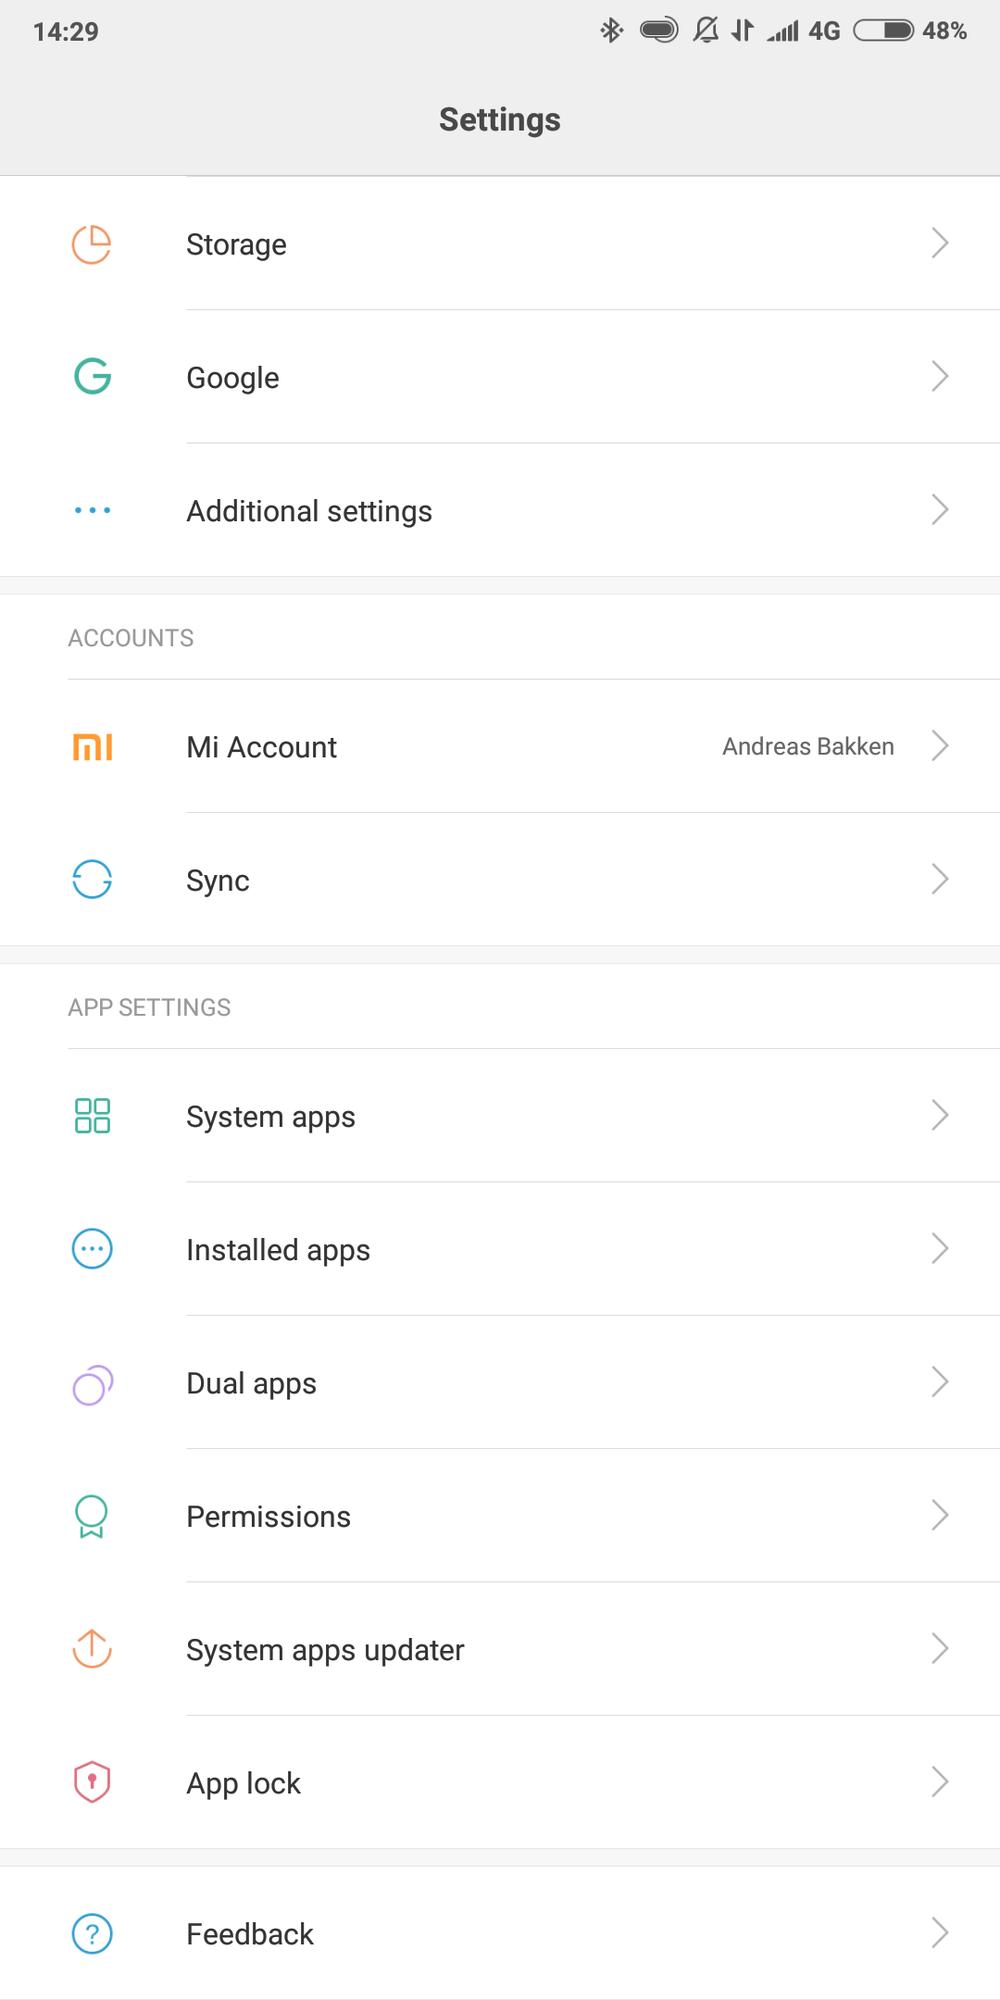 Screenshot_2018-07-18-14-29-42-900_com.android.settings.png